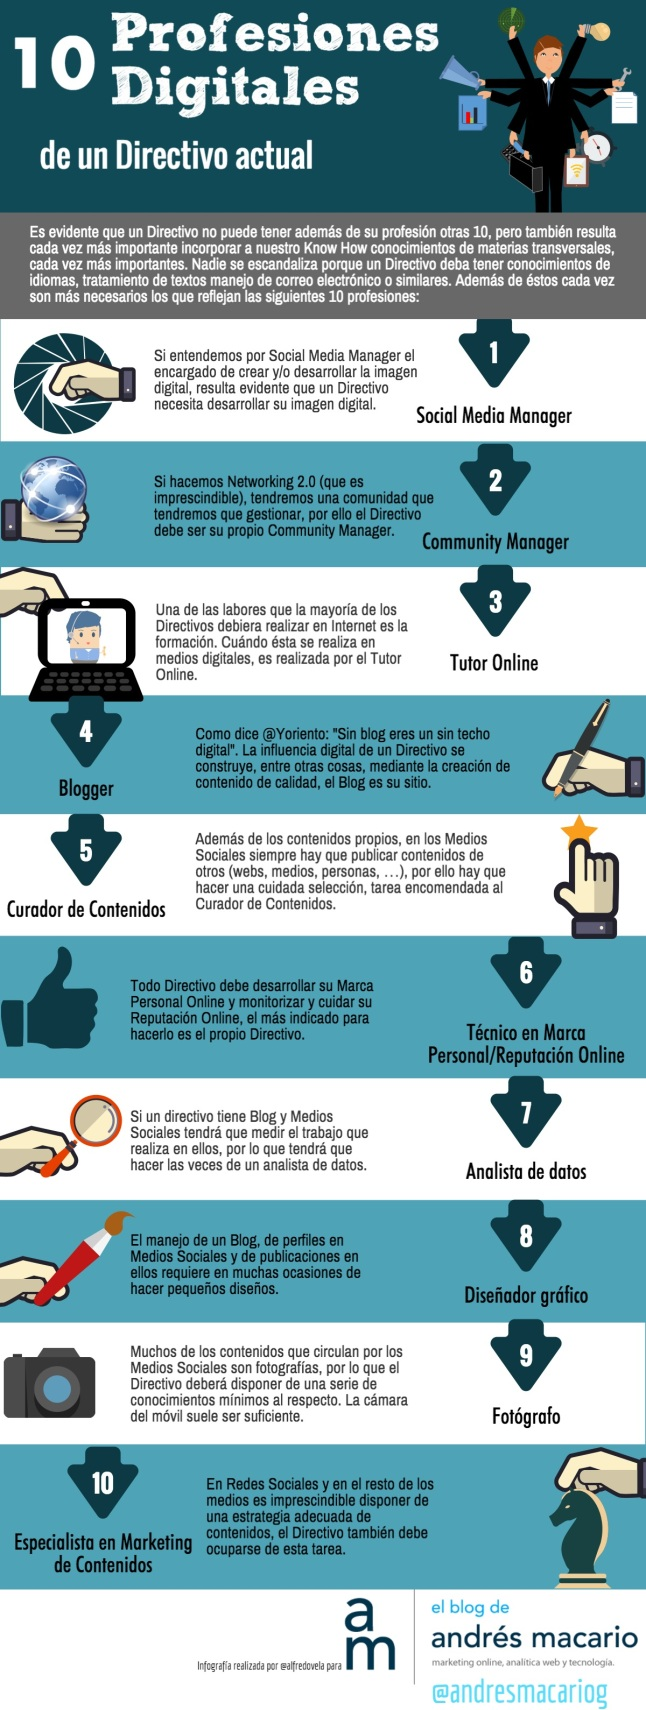 10-profesiones-digitales-directivo-actual-infografia-andres-macario-alfredo-vela